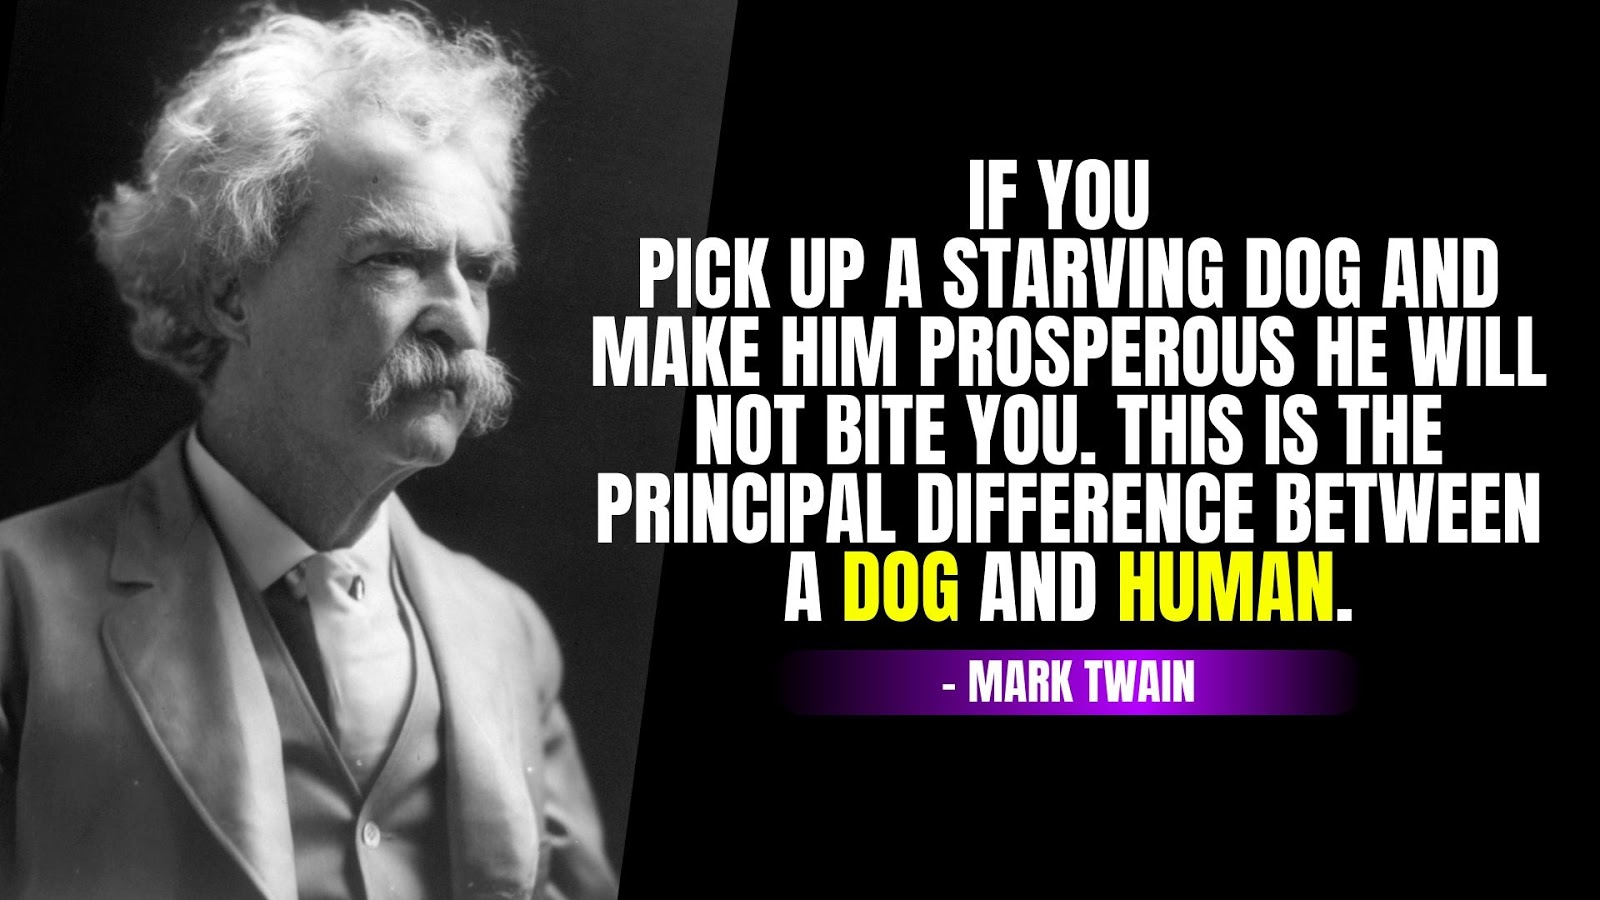 Mark Twain Quotes Dog & Human, Mark Twain Quotes on Life